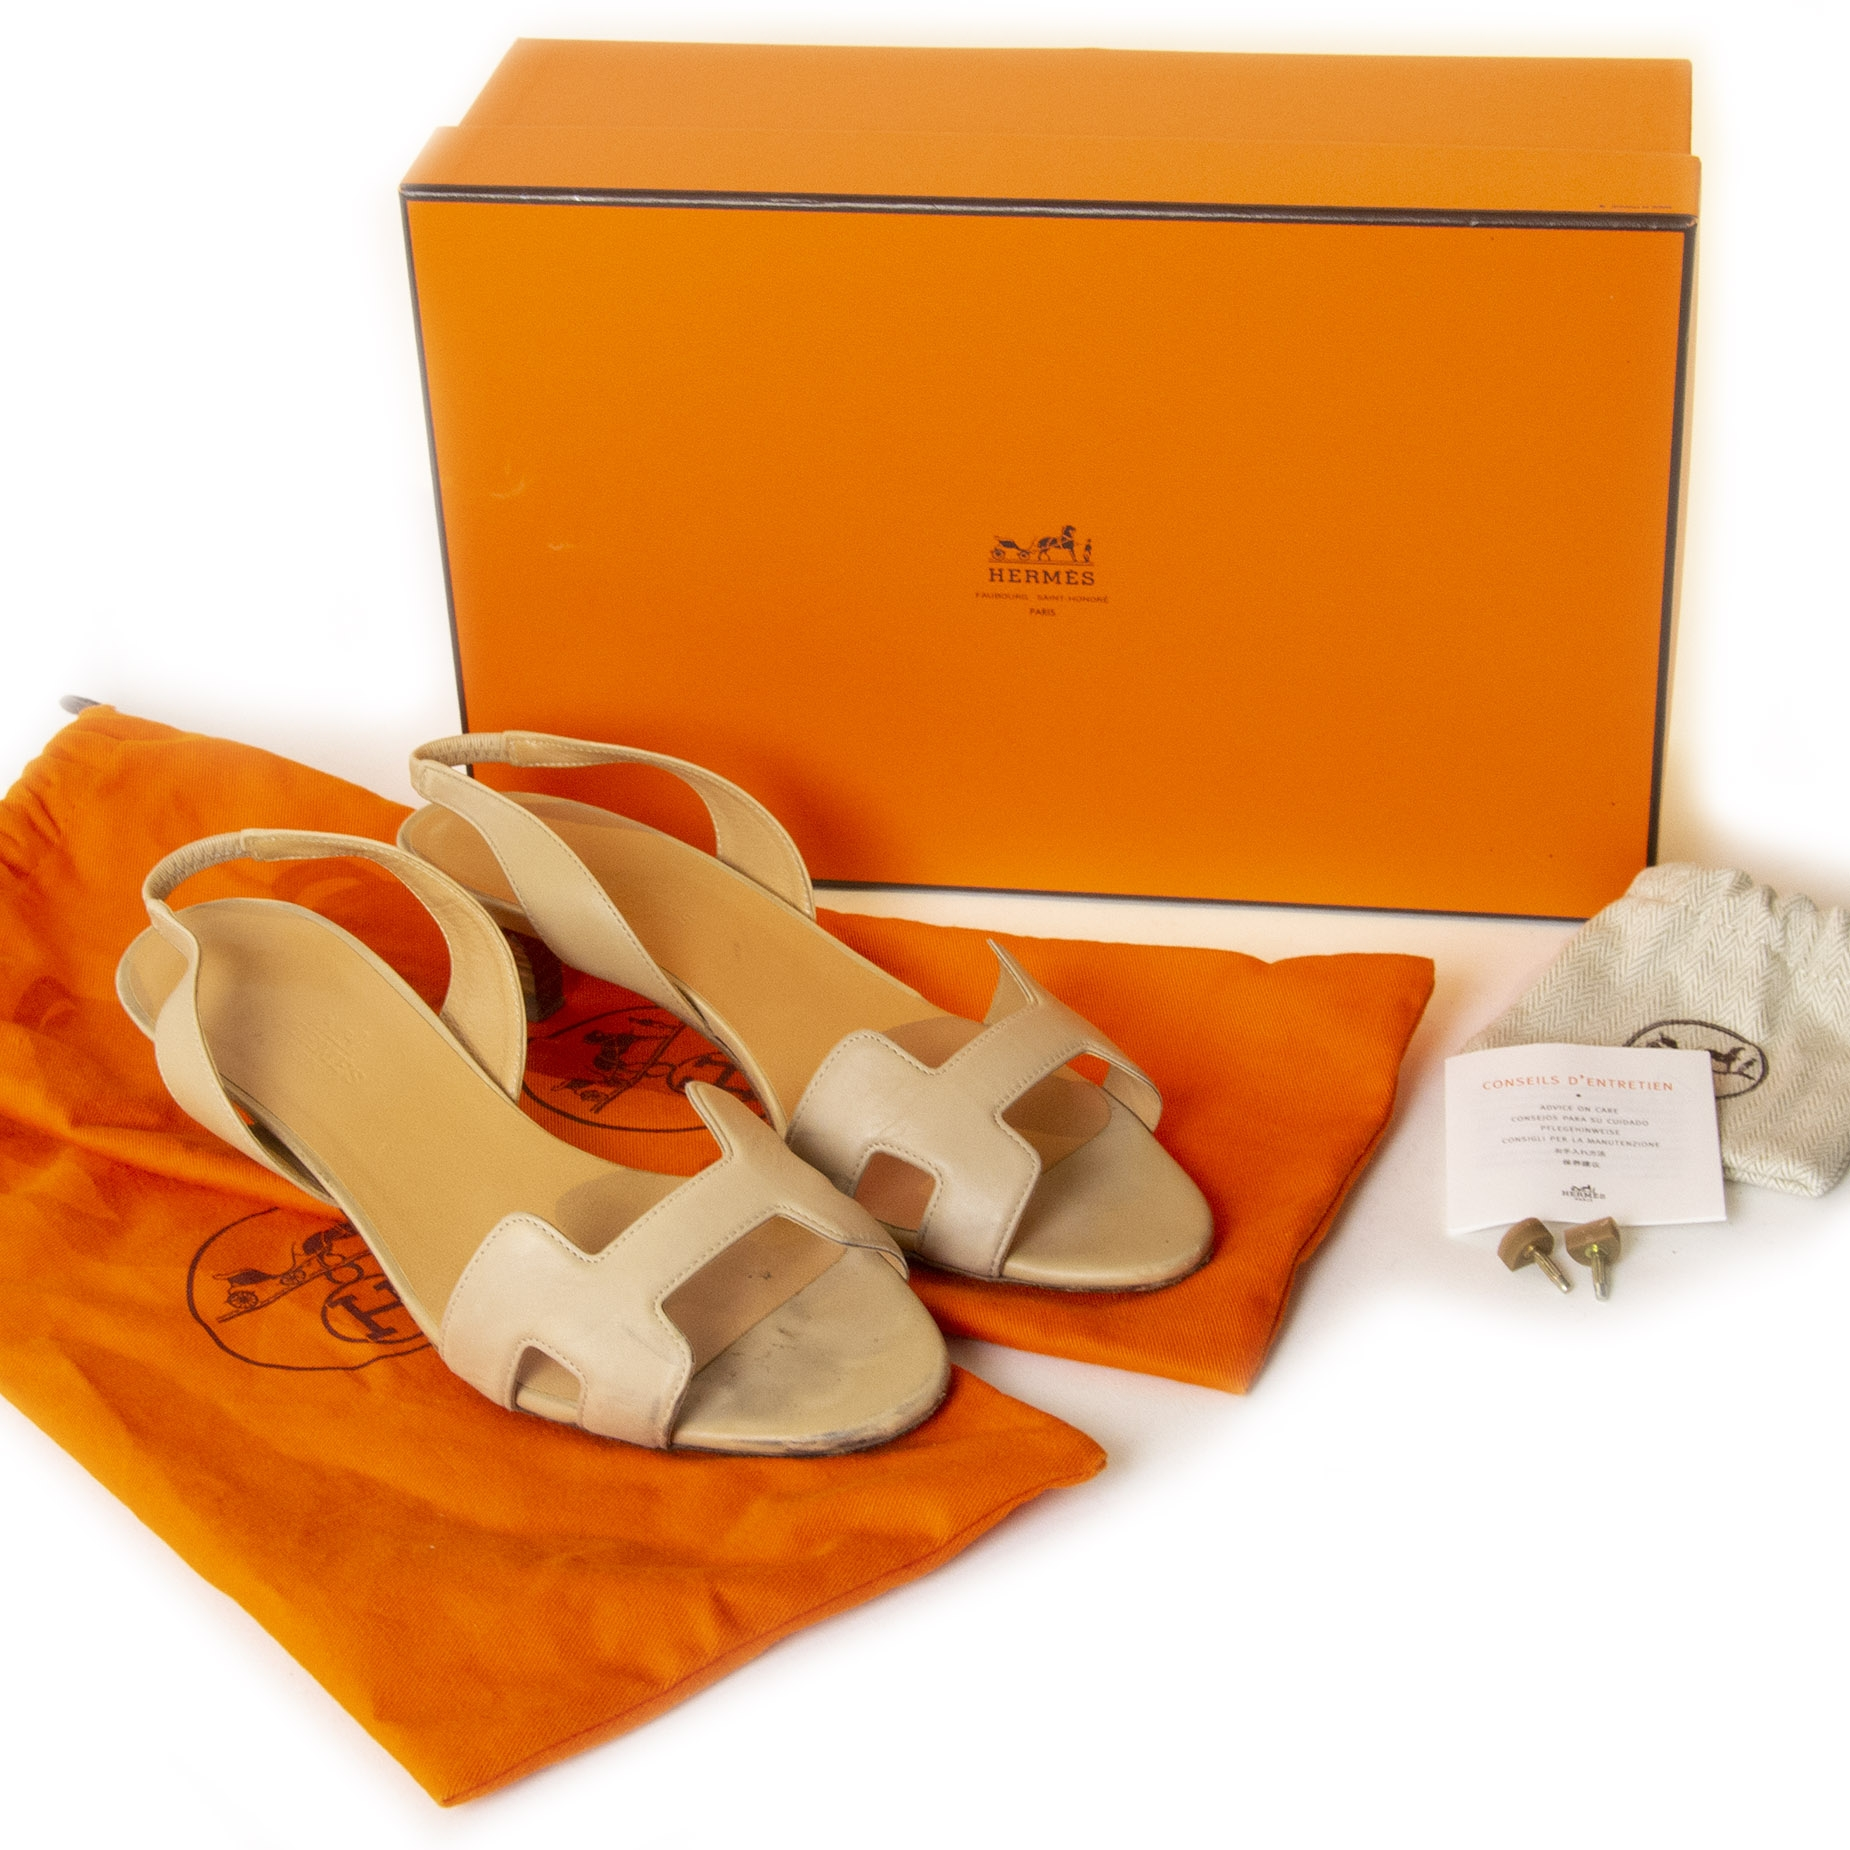 Authentieke tweedehands vintage Hermès Ottomane Kitten Heels - Size 36 koop online webshop LabelLOV